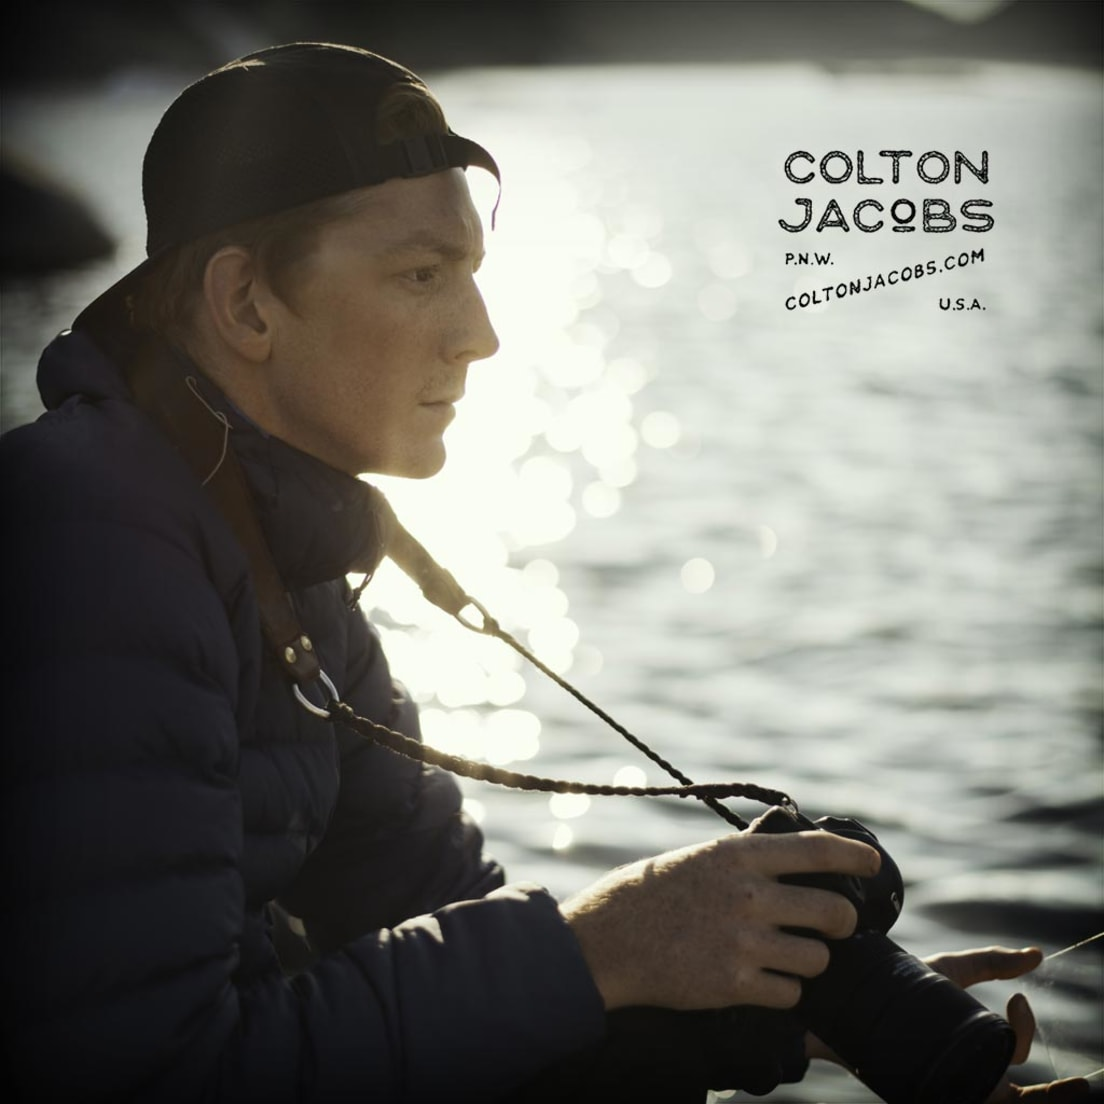 Colton Jacobs